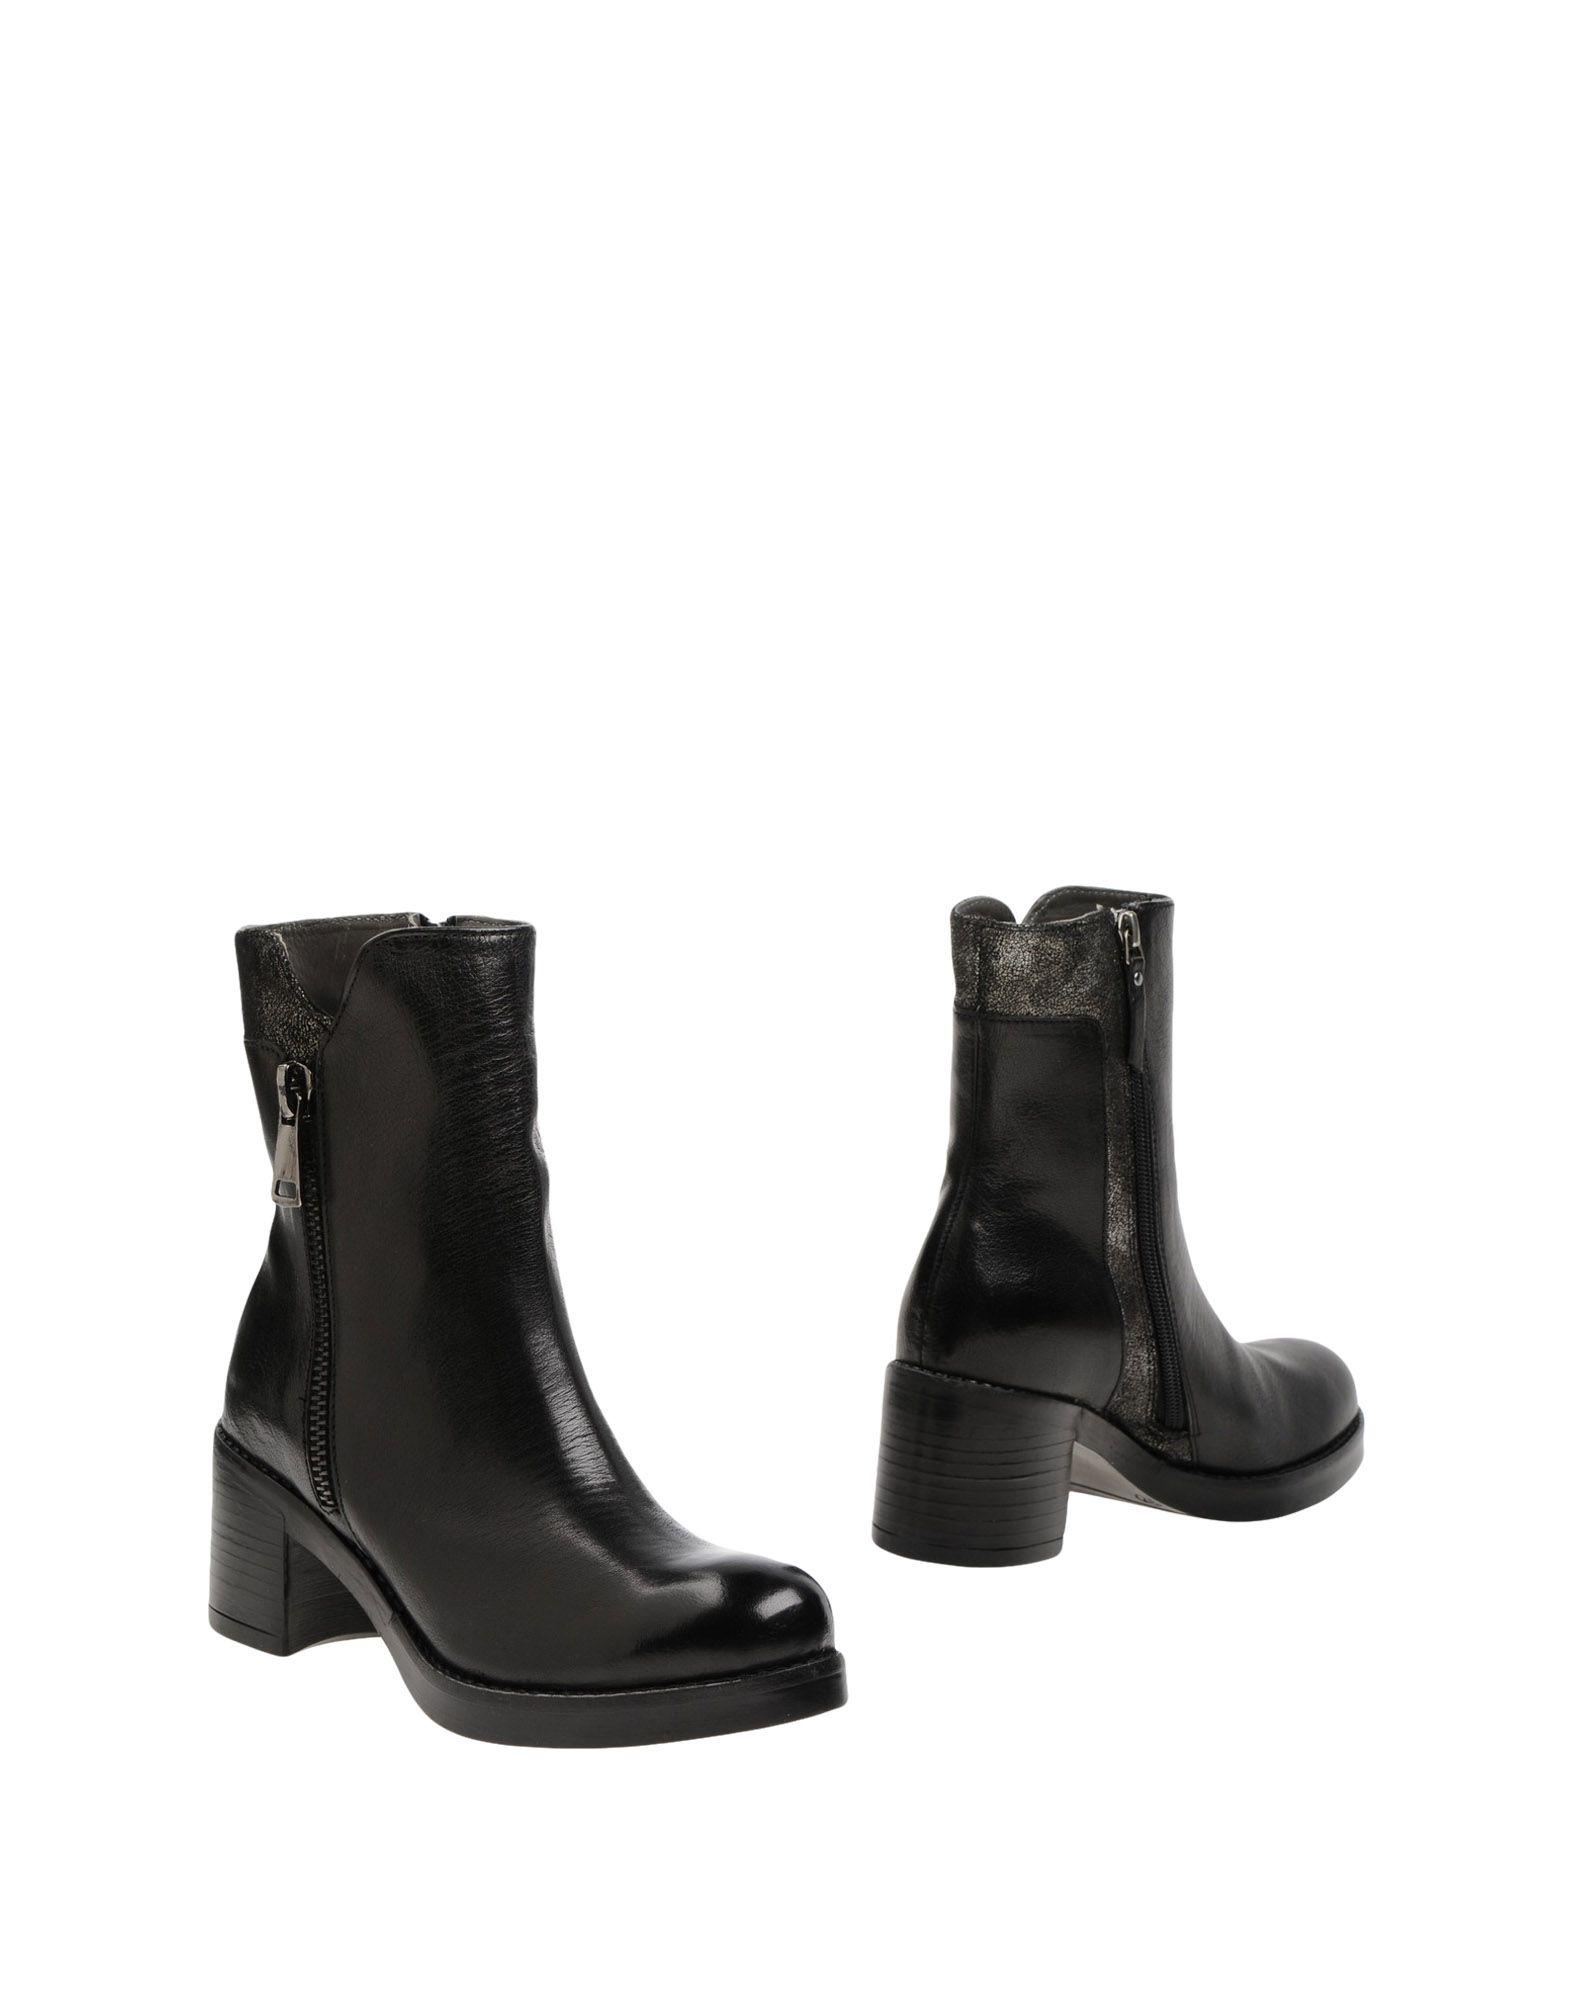 E...Vee Stiefelette Damen  11408859DT Gute beliebte Qualität beliebte Gute Schuhe a80b45